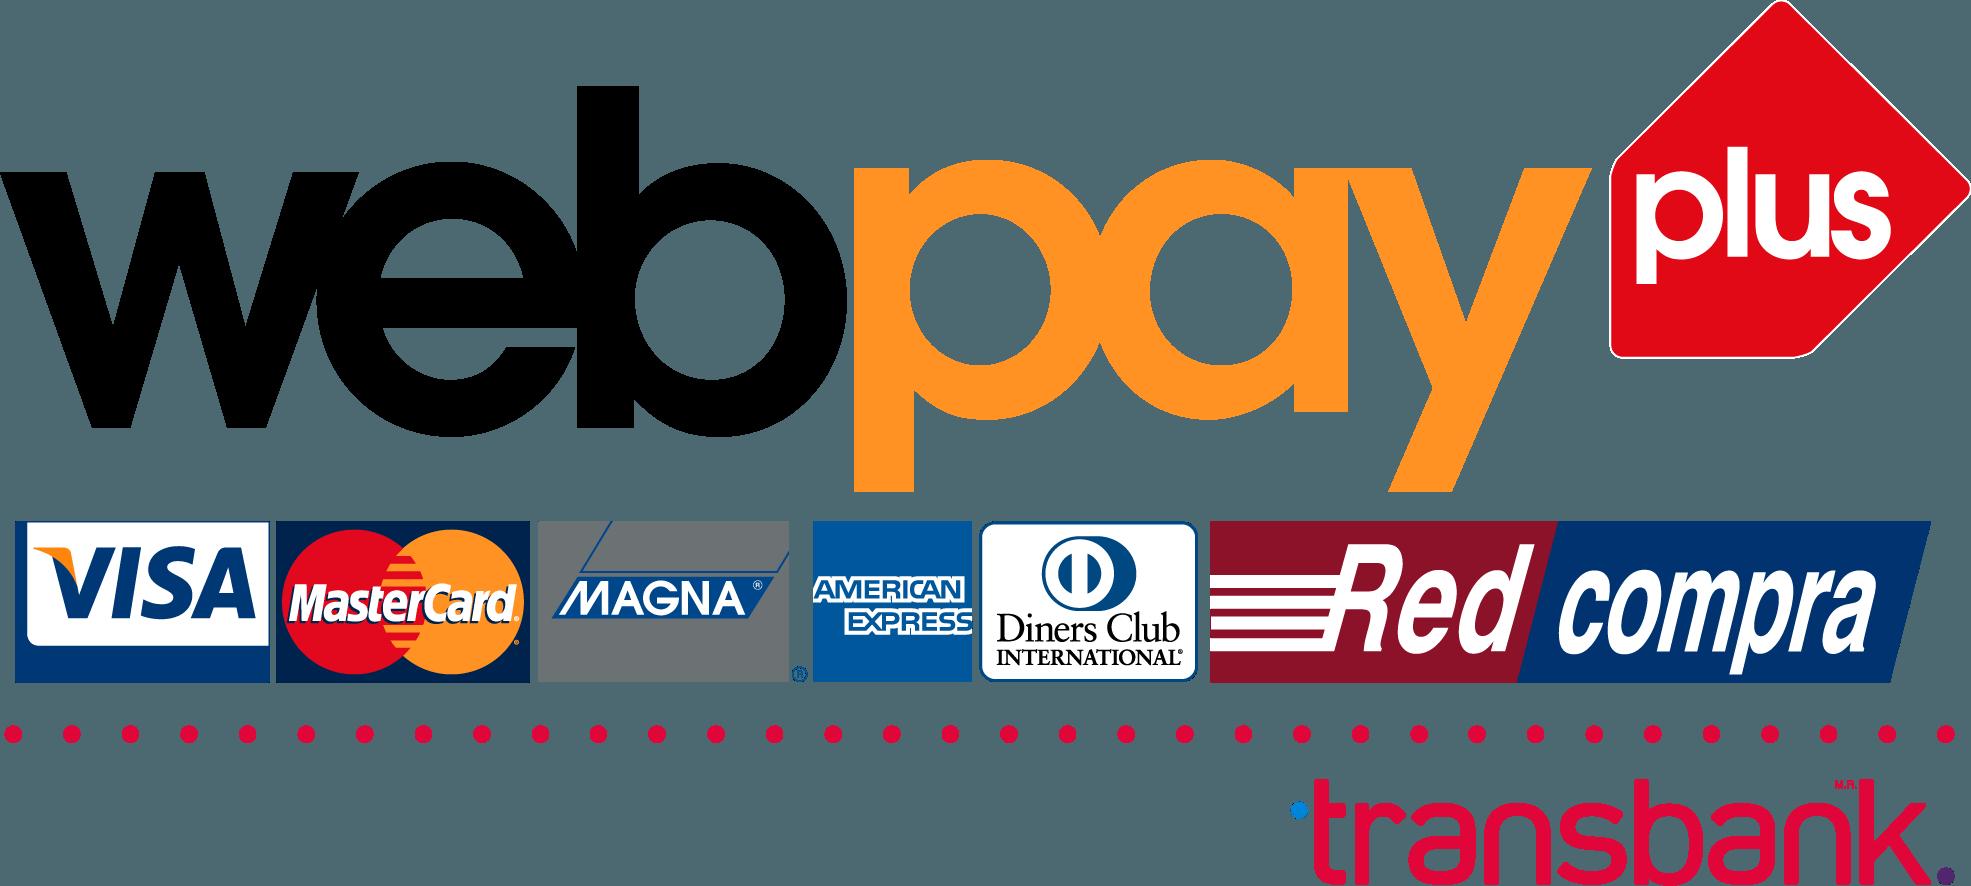 kisspng-payment-system-transbank-s-a-ser